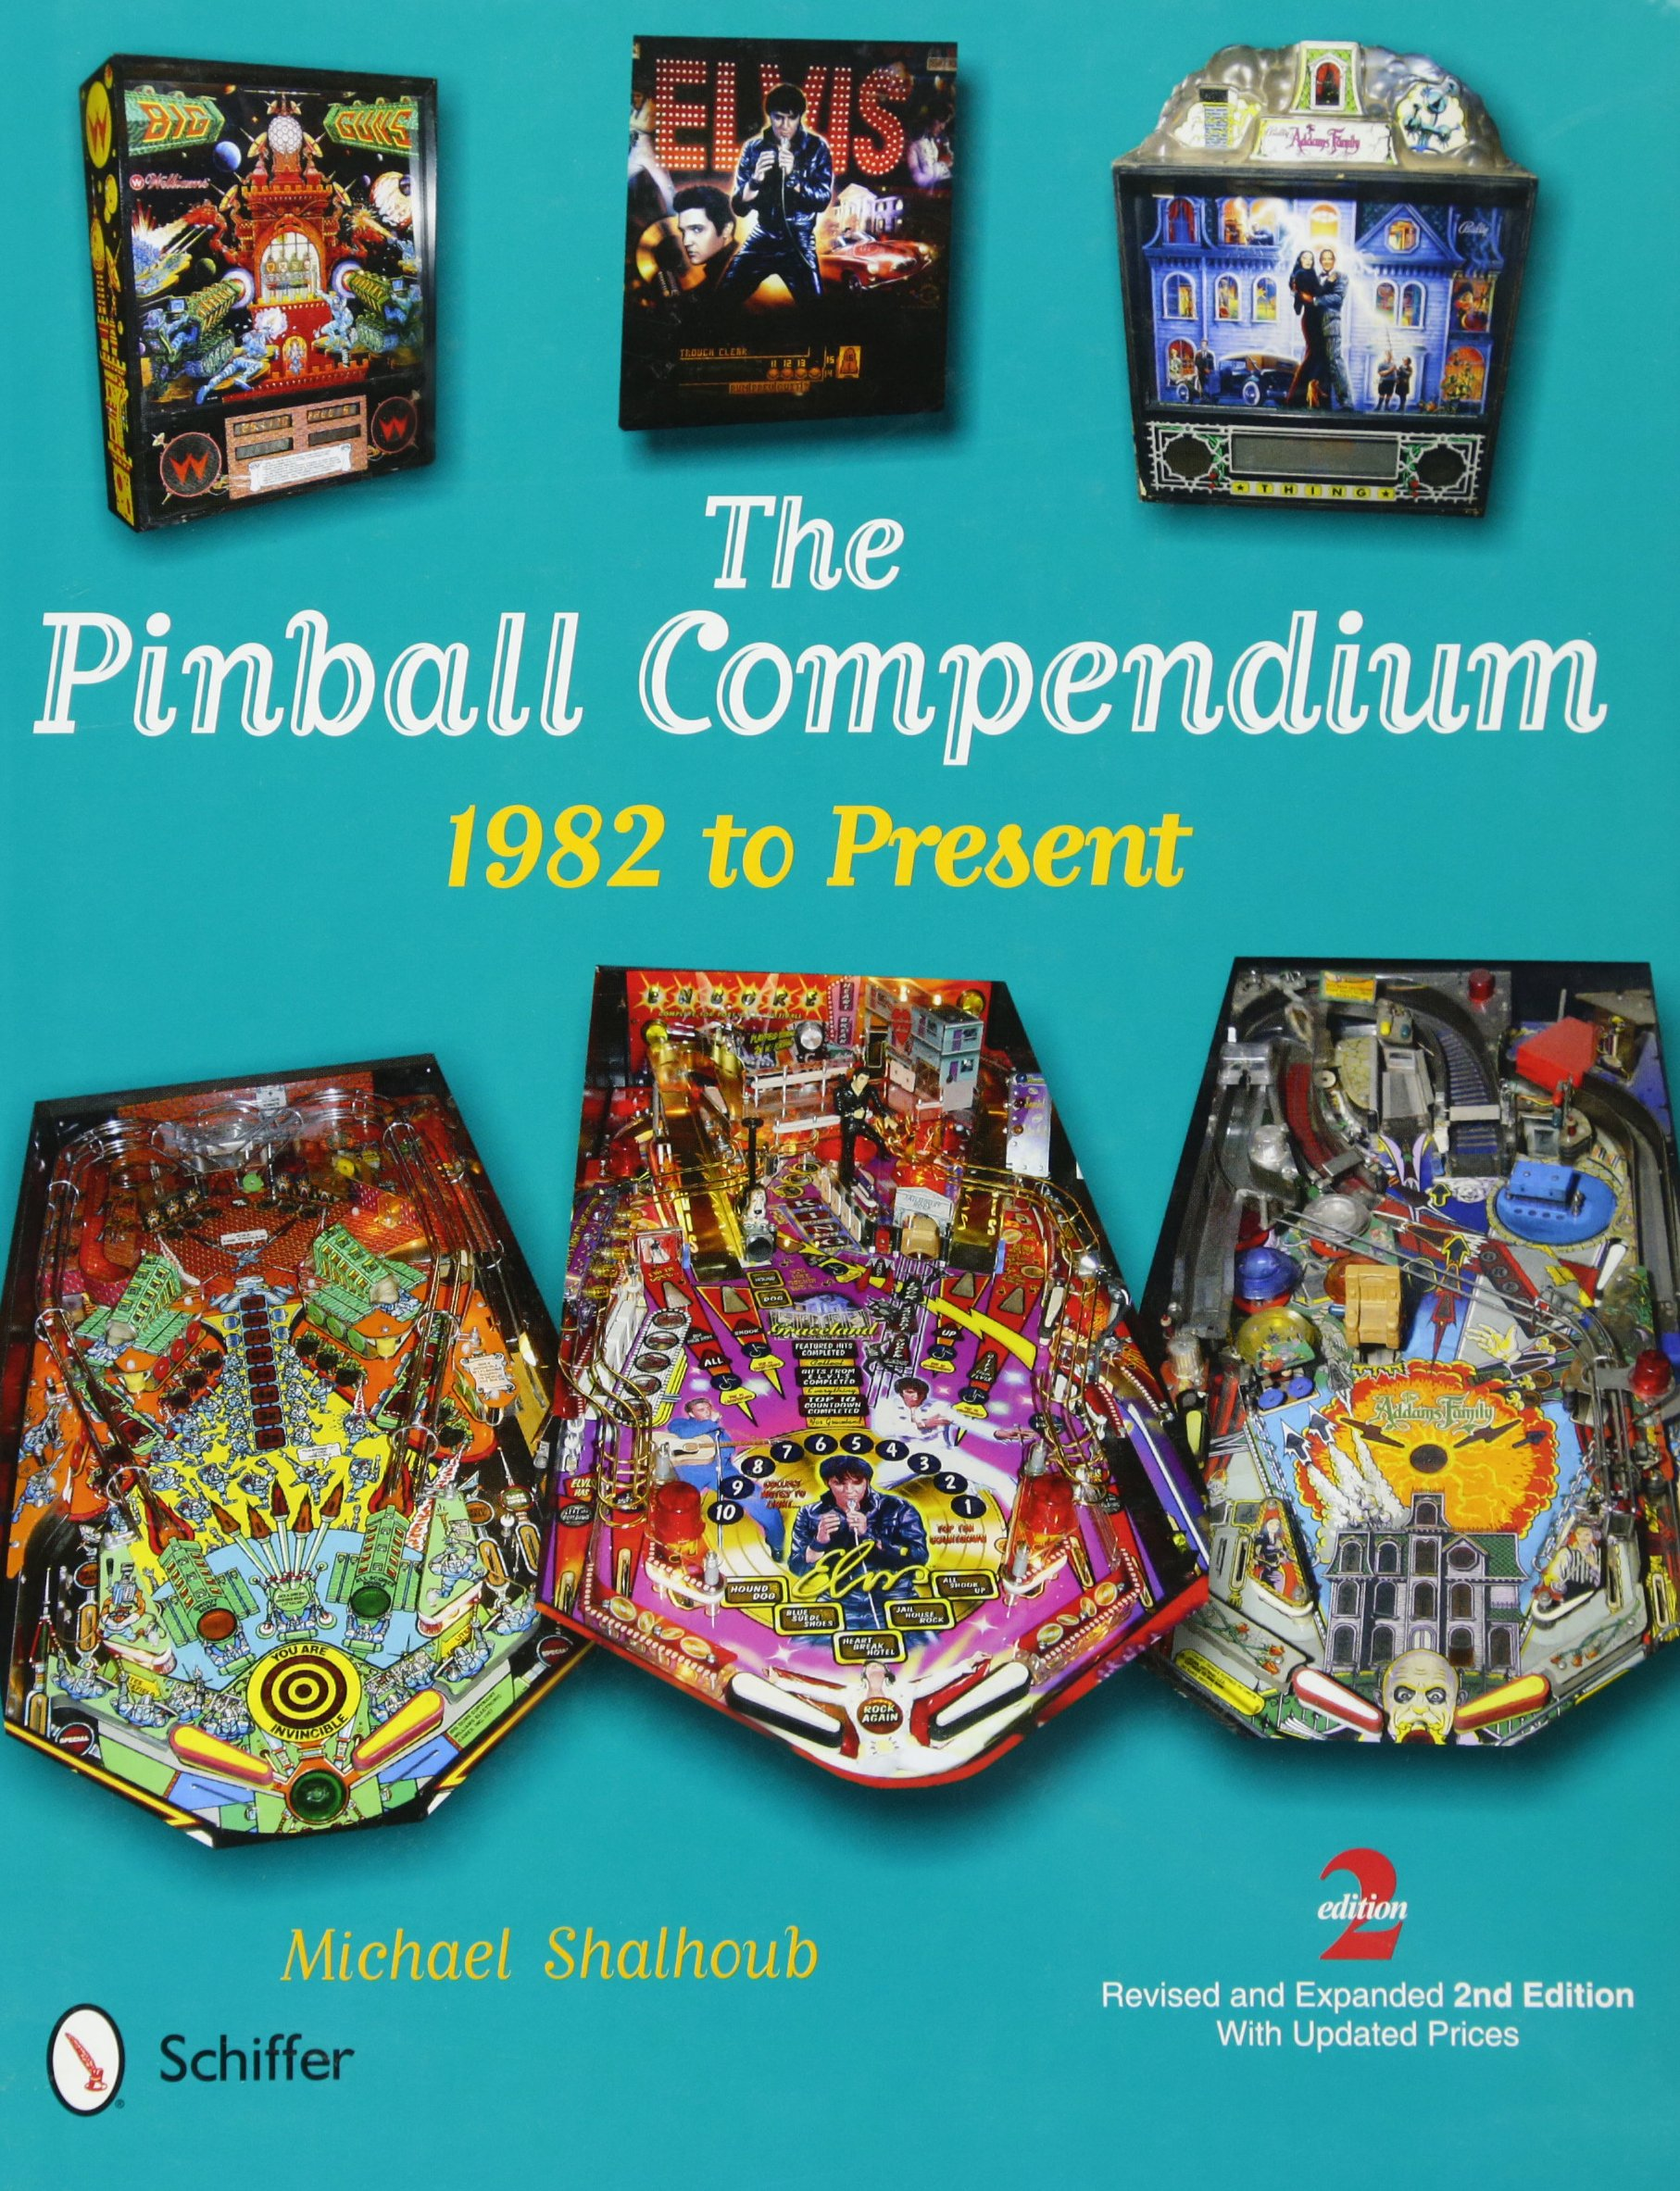 91UBe+ffBxL - The Pinball Compendium: 1982 to Present